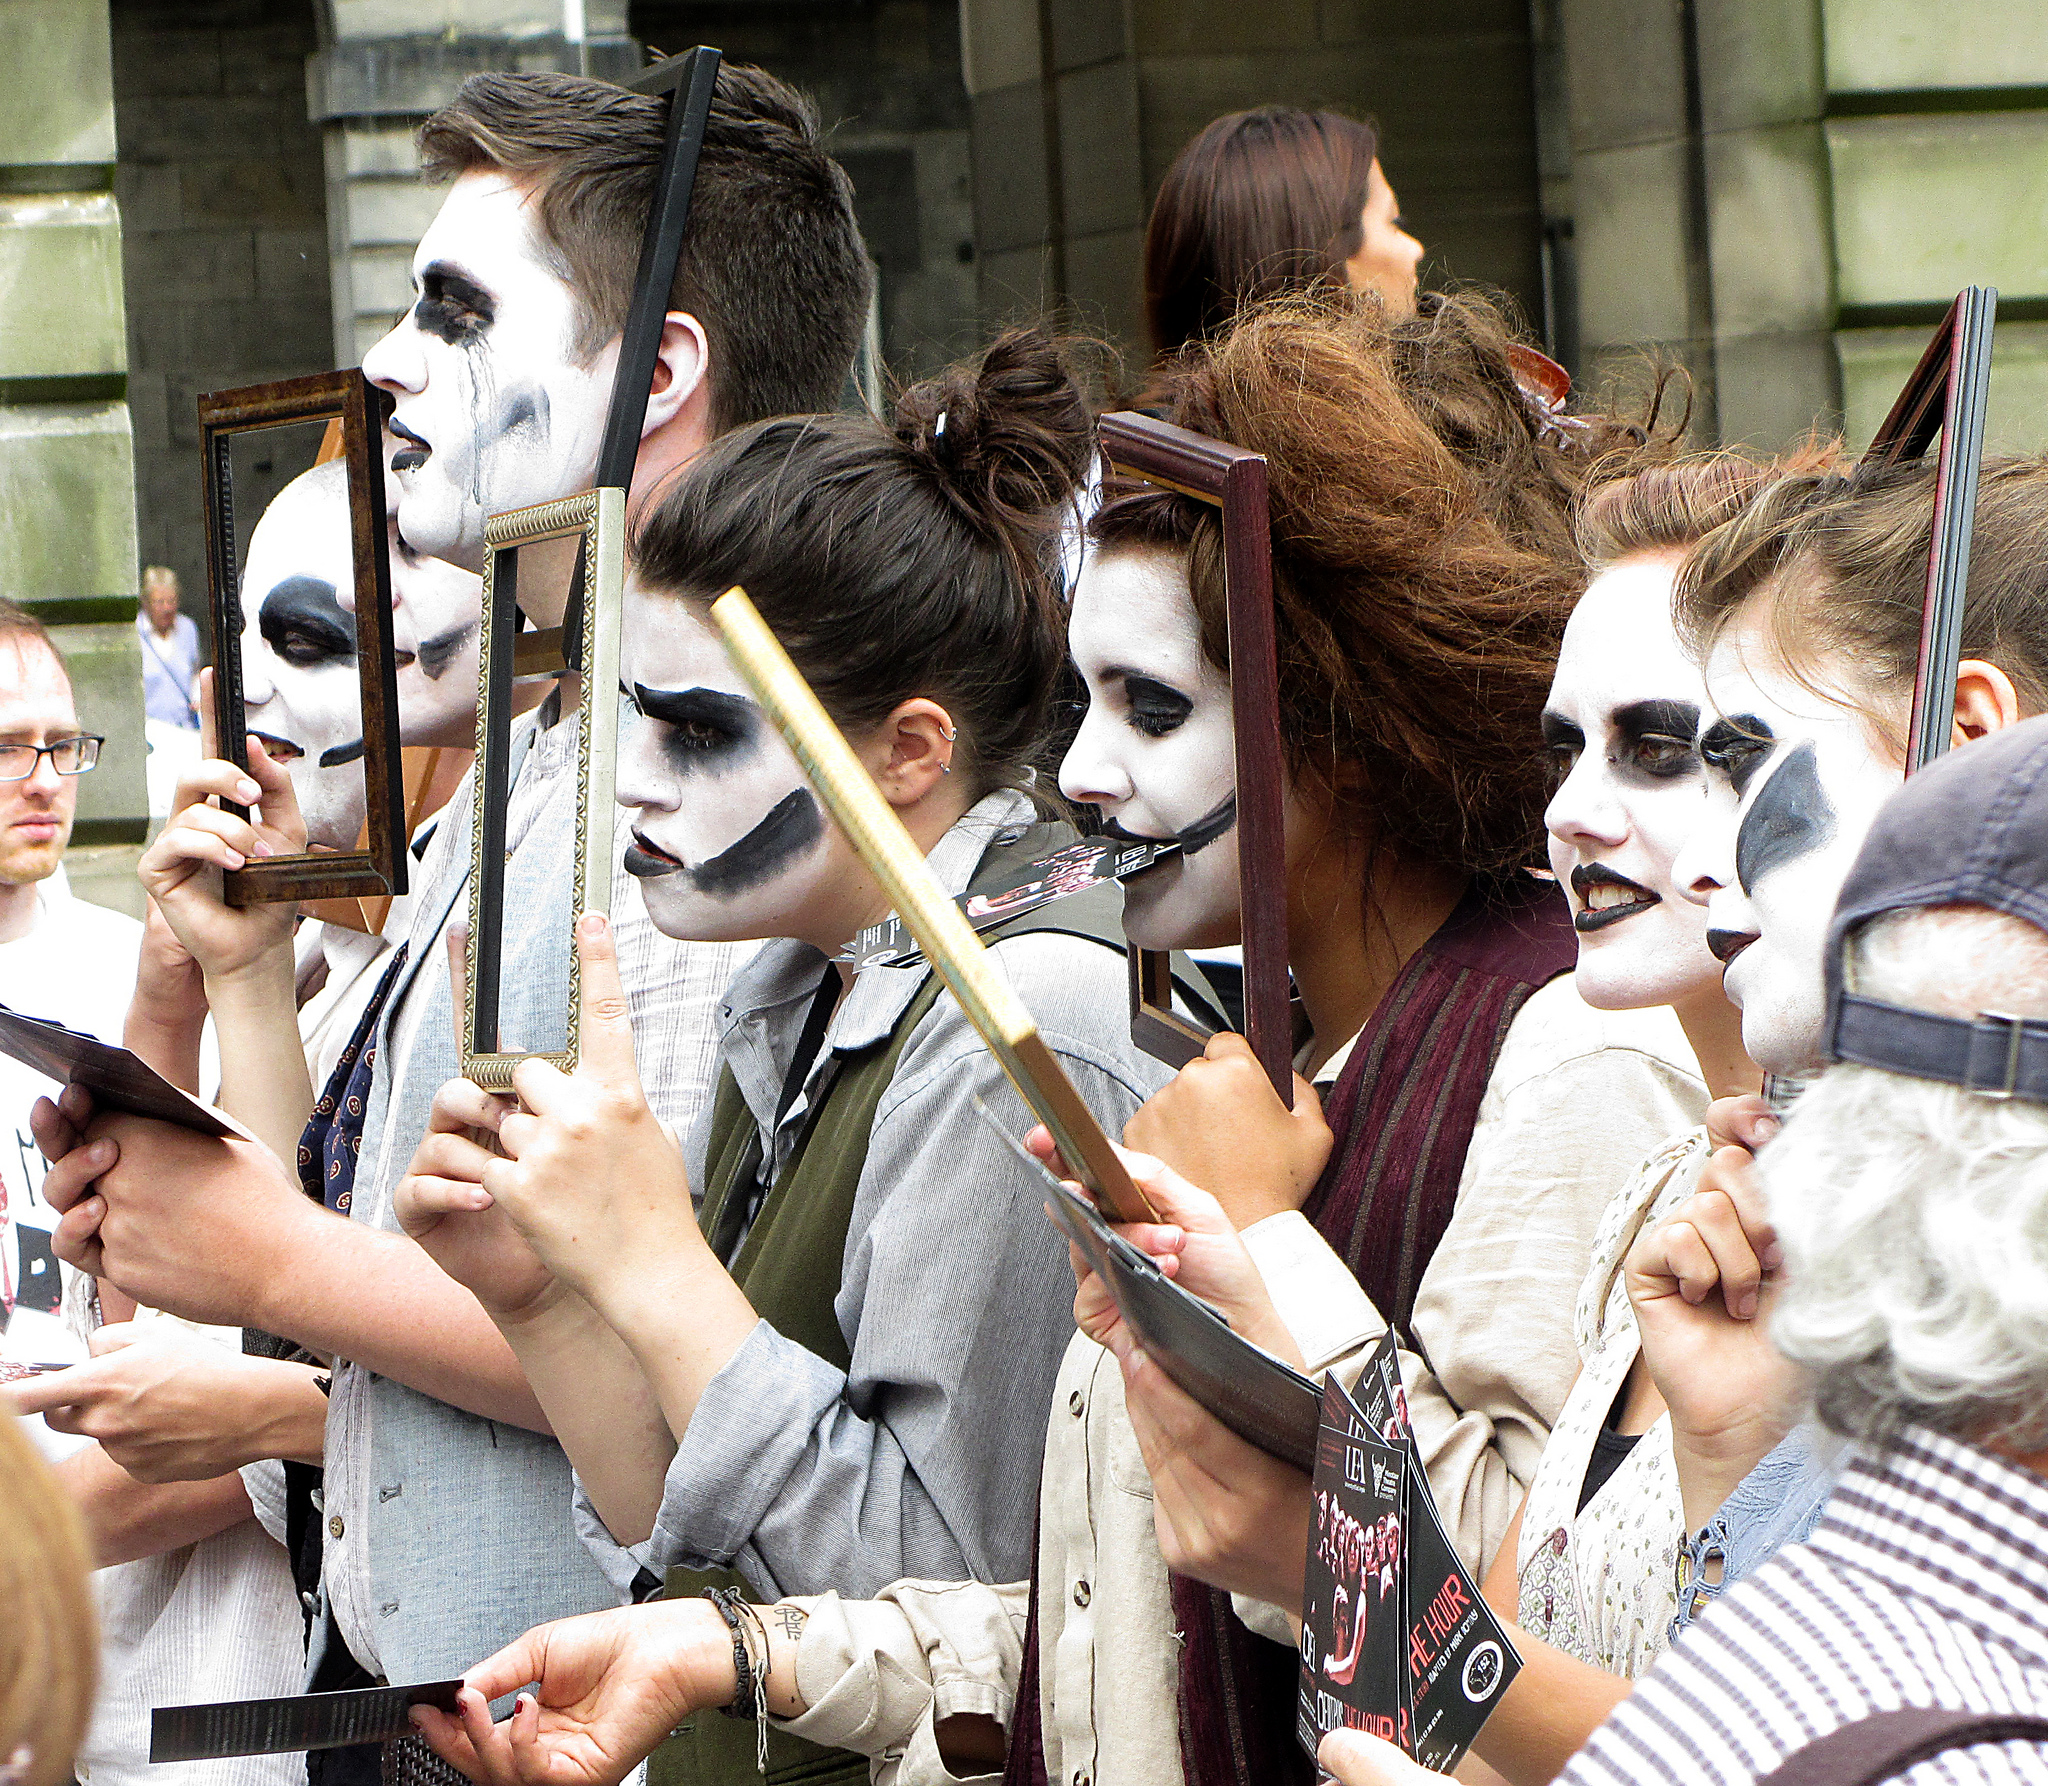 """Edinburgh Fringe Performers"" by Bob the Lomond via Flickr Creative Commons"